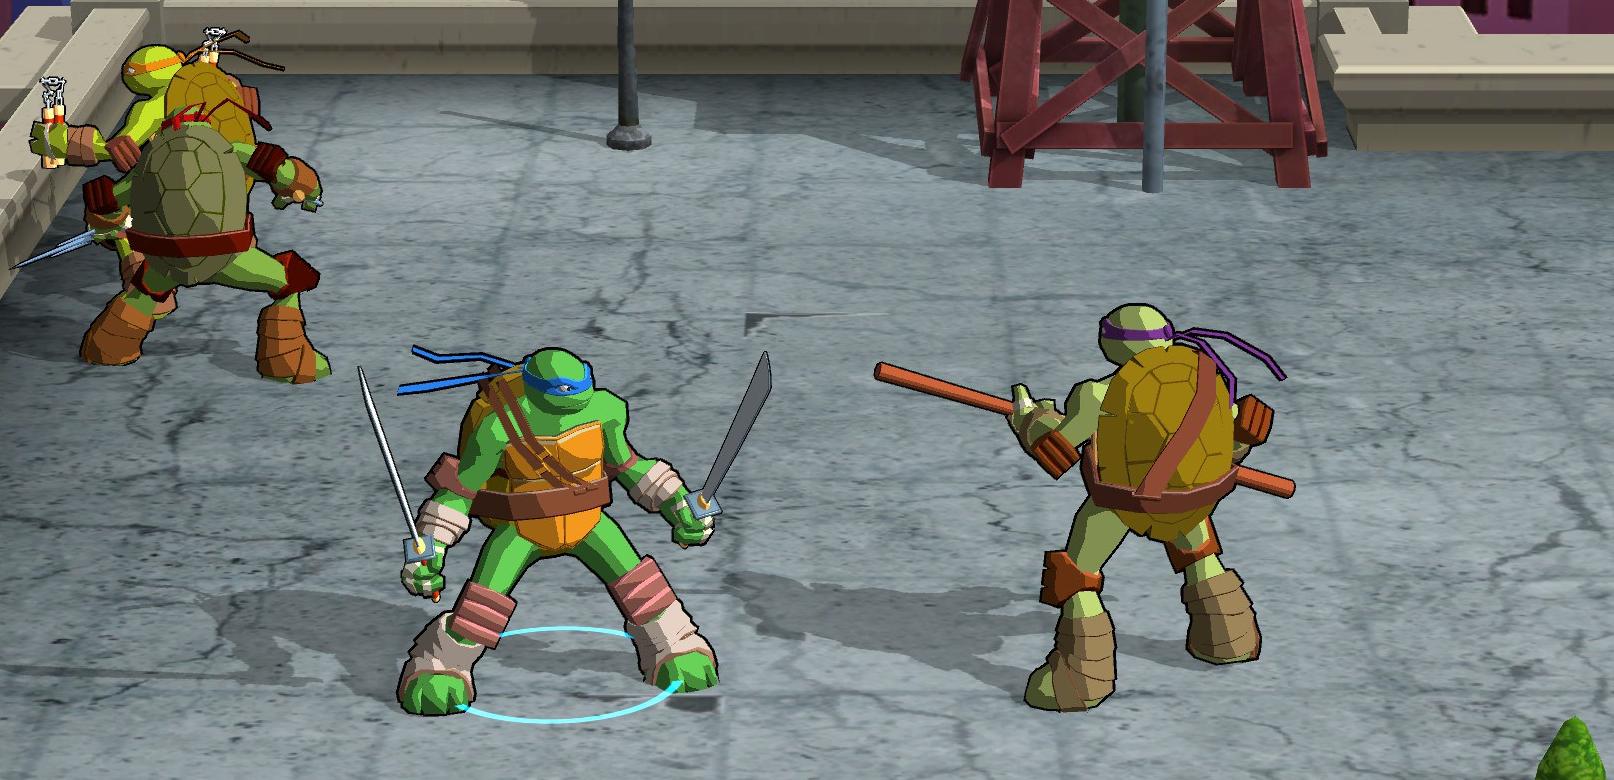 Review - Teenage Mutant Ninja Turtles: Portal Power (PC)